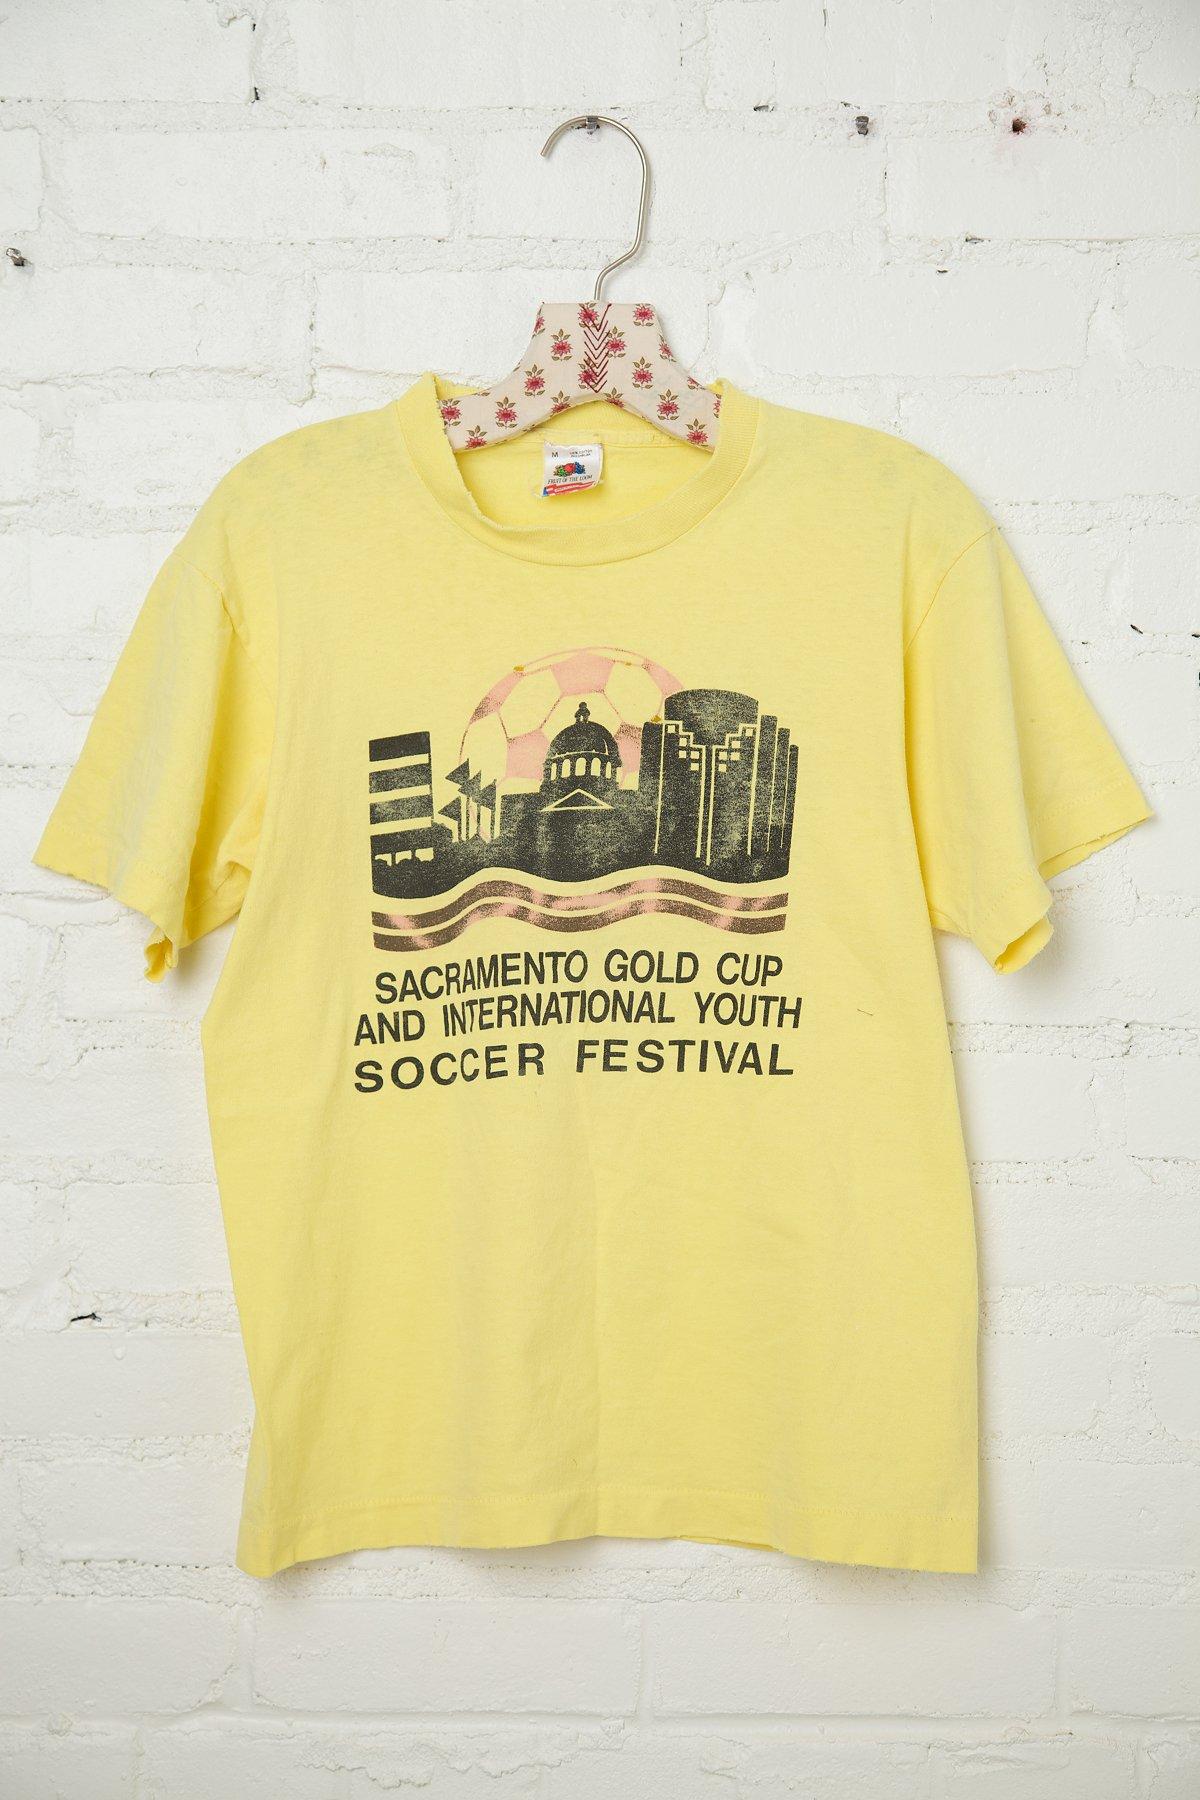 Vintage Soccer Festival Tee